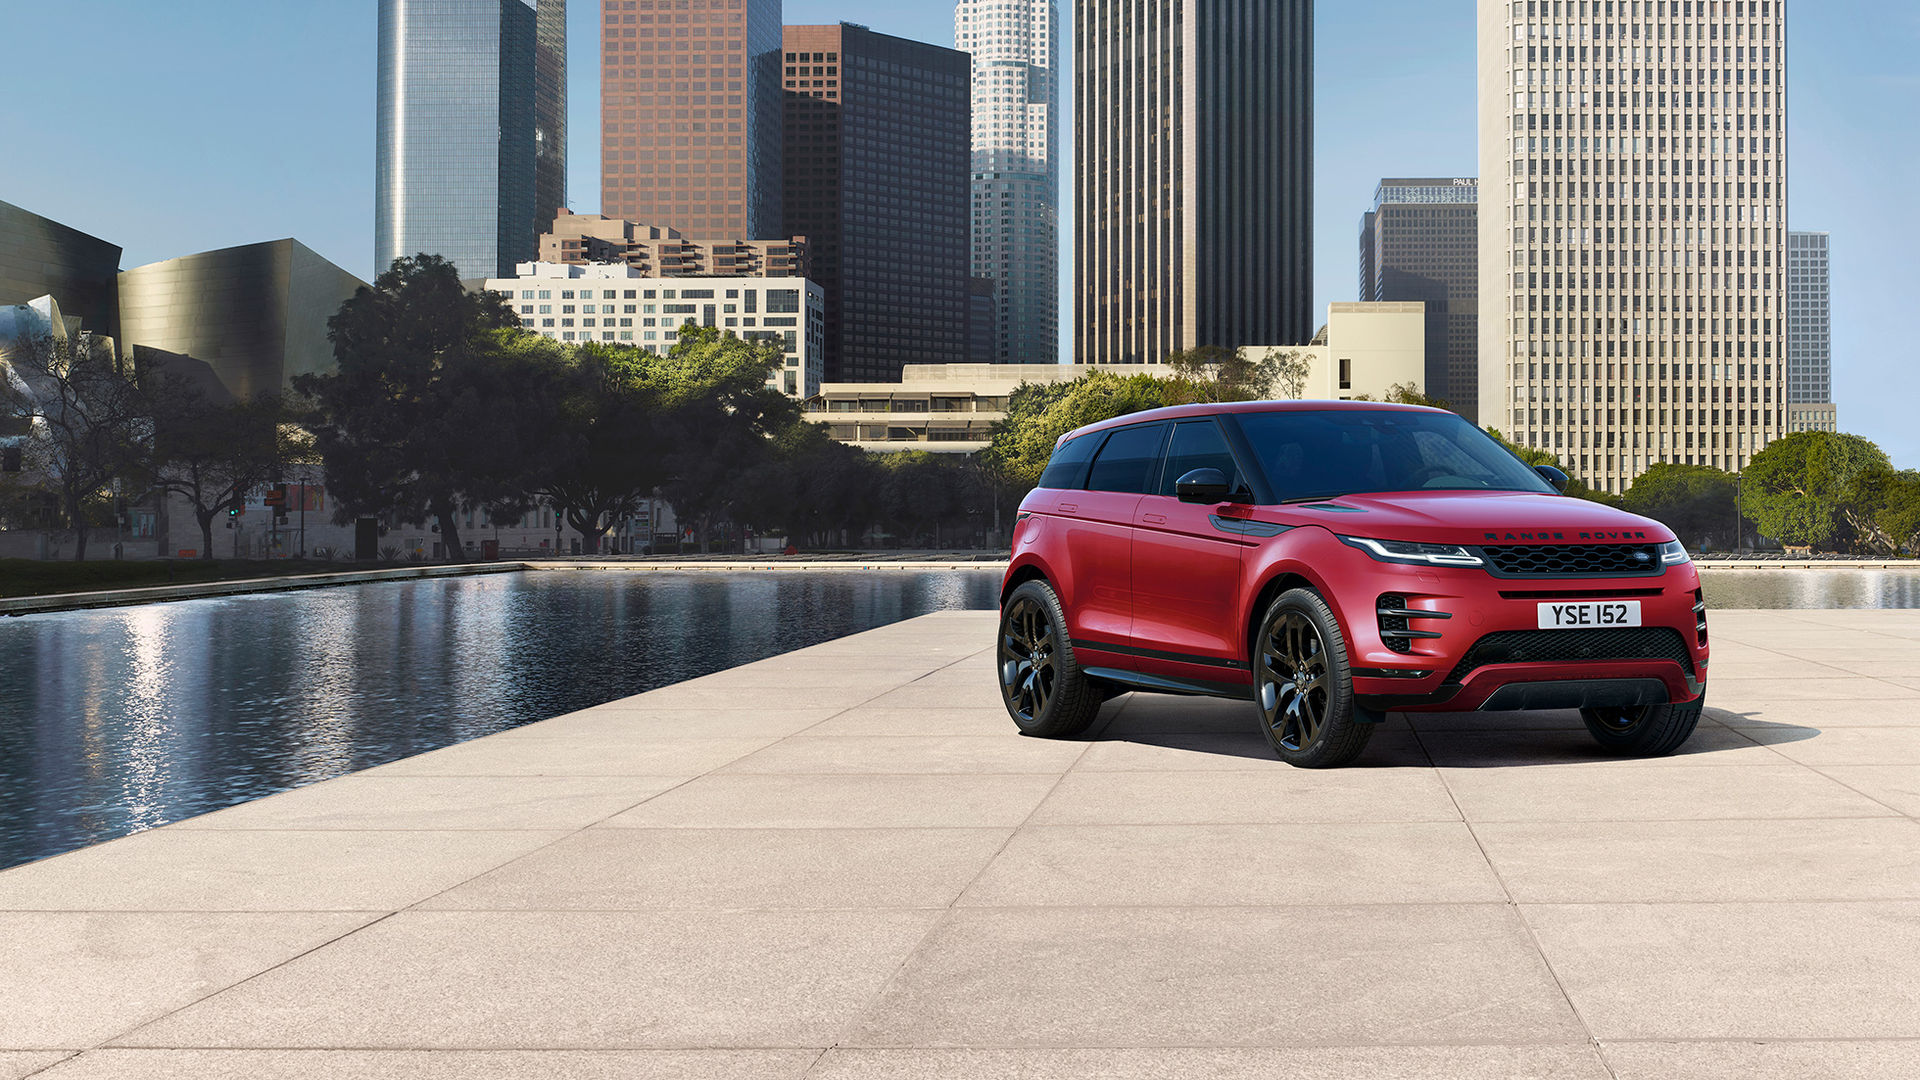 Range Rovers lilla lyx-SUV Evoque i ny förpackning